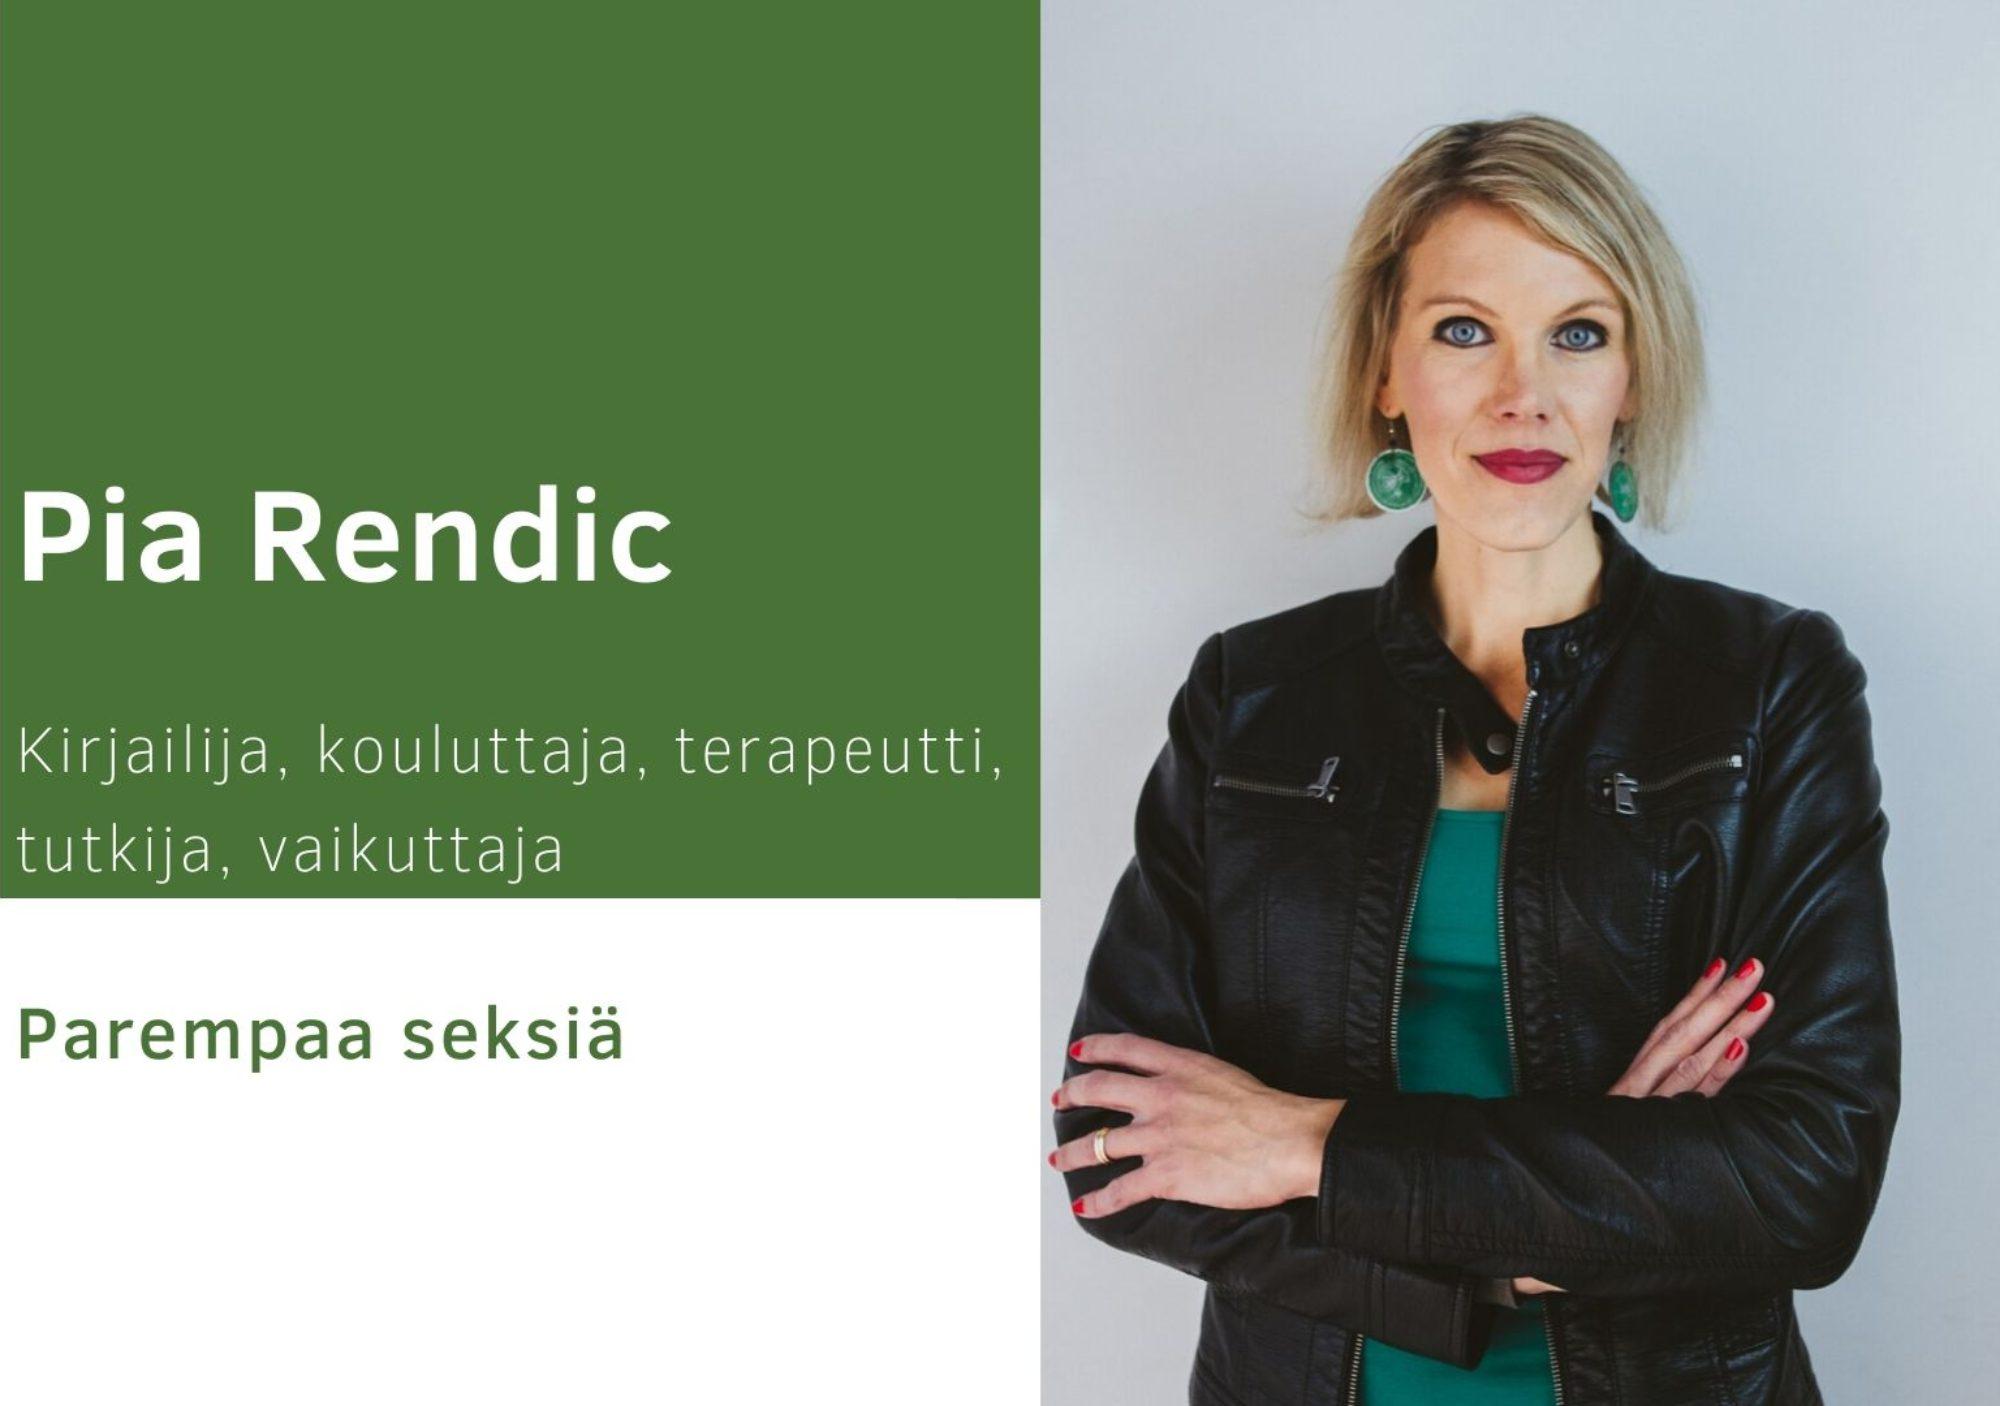 Pia Rendic